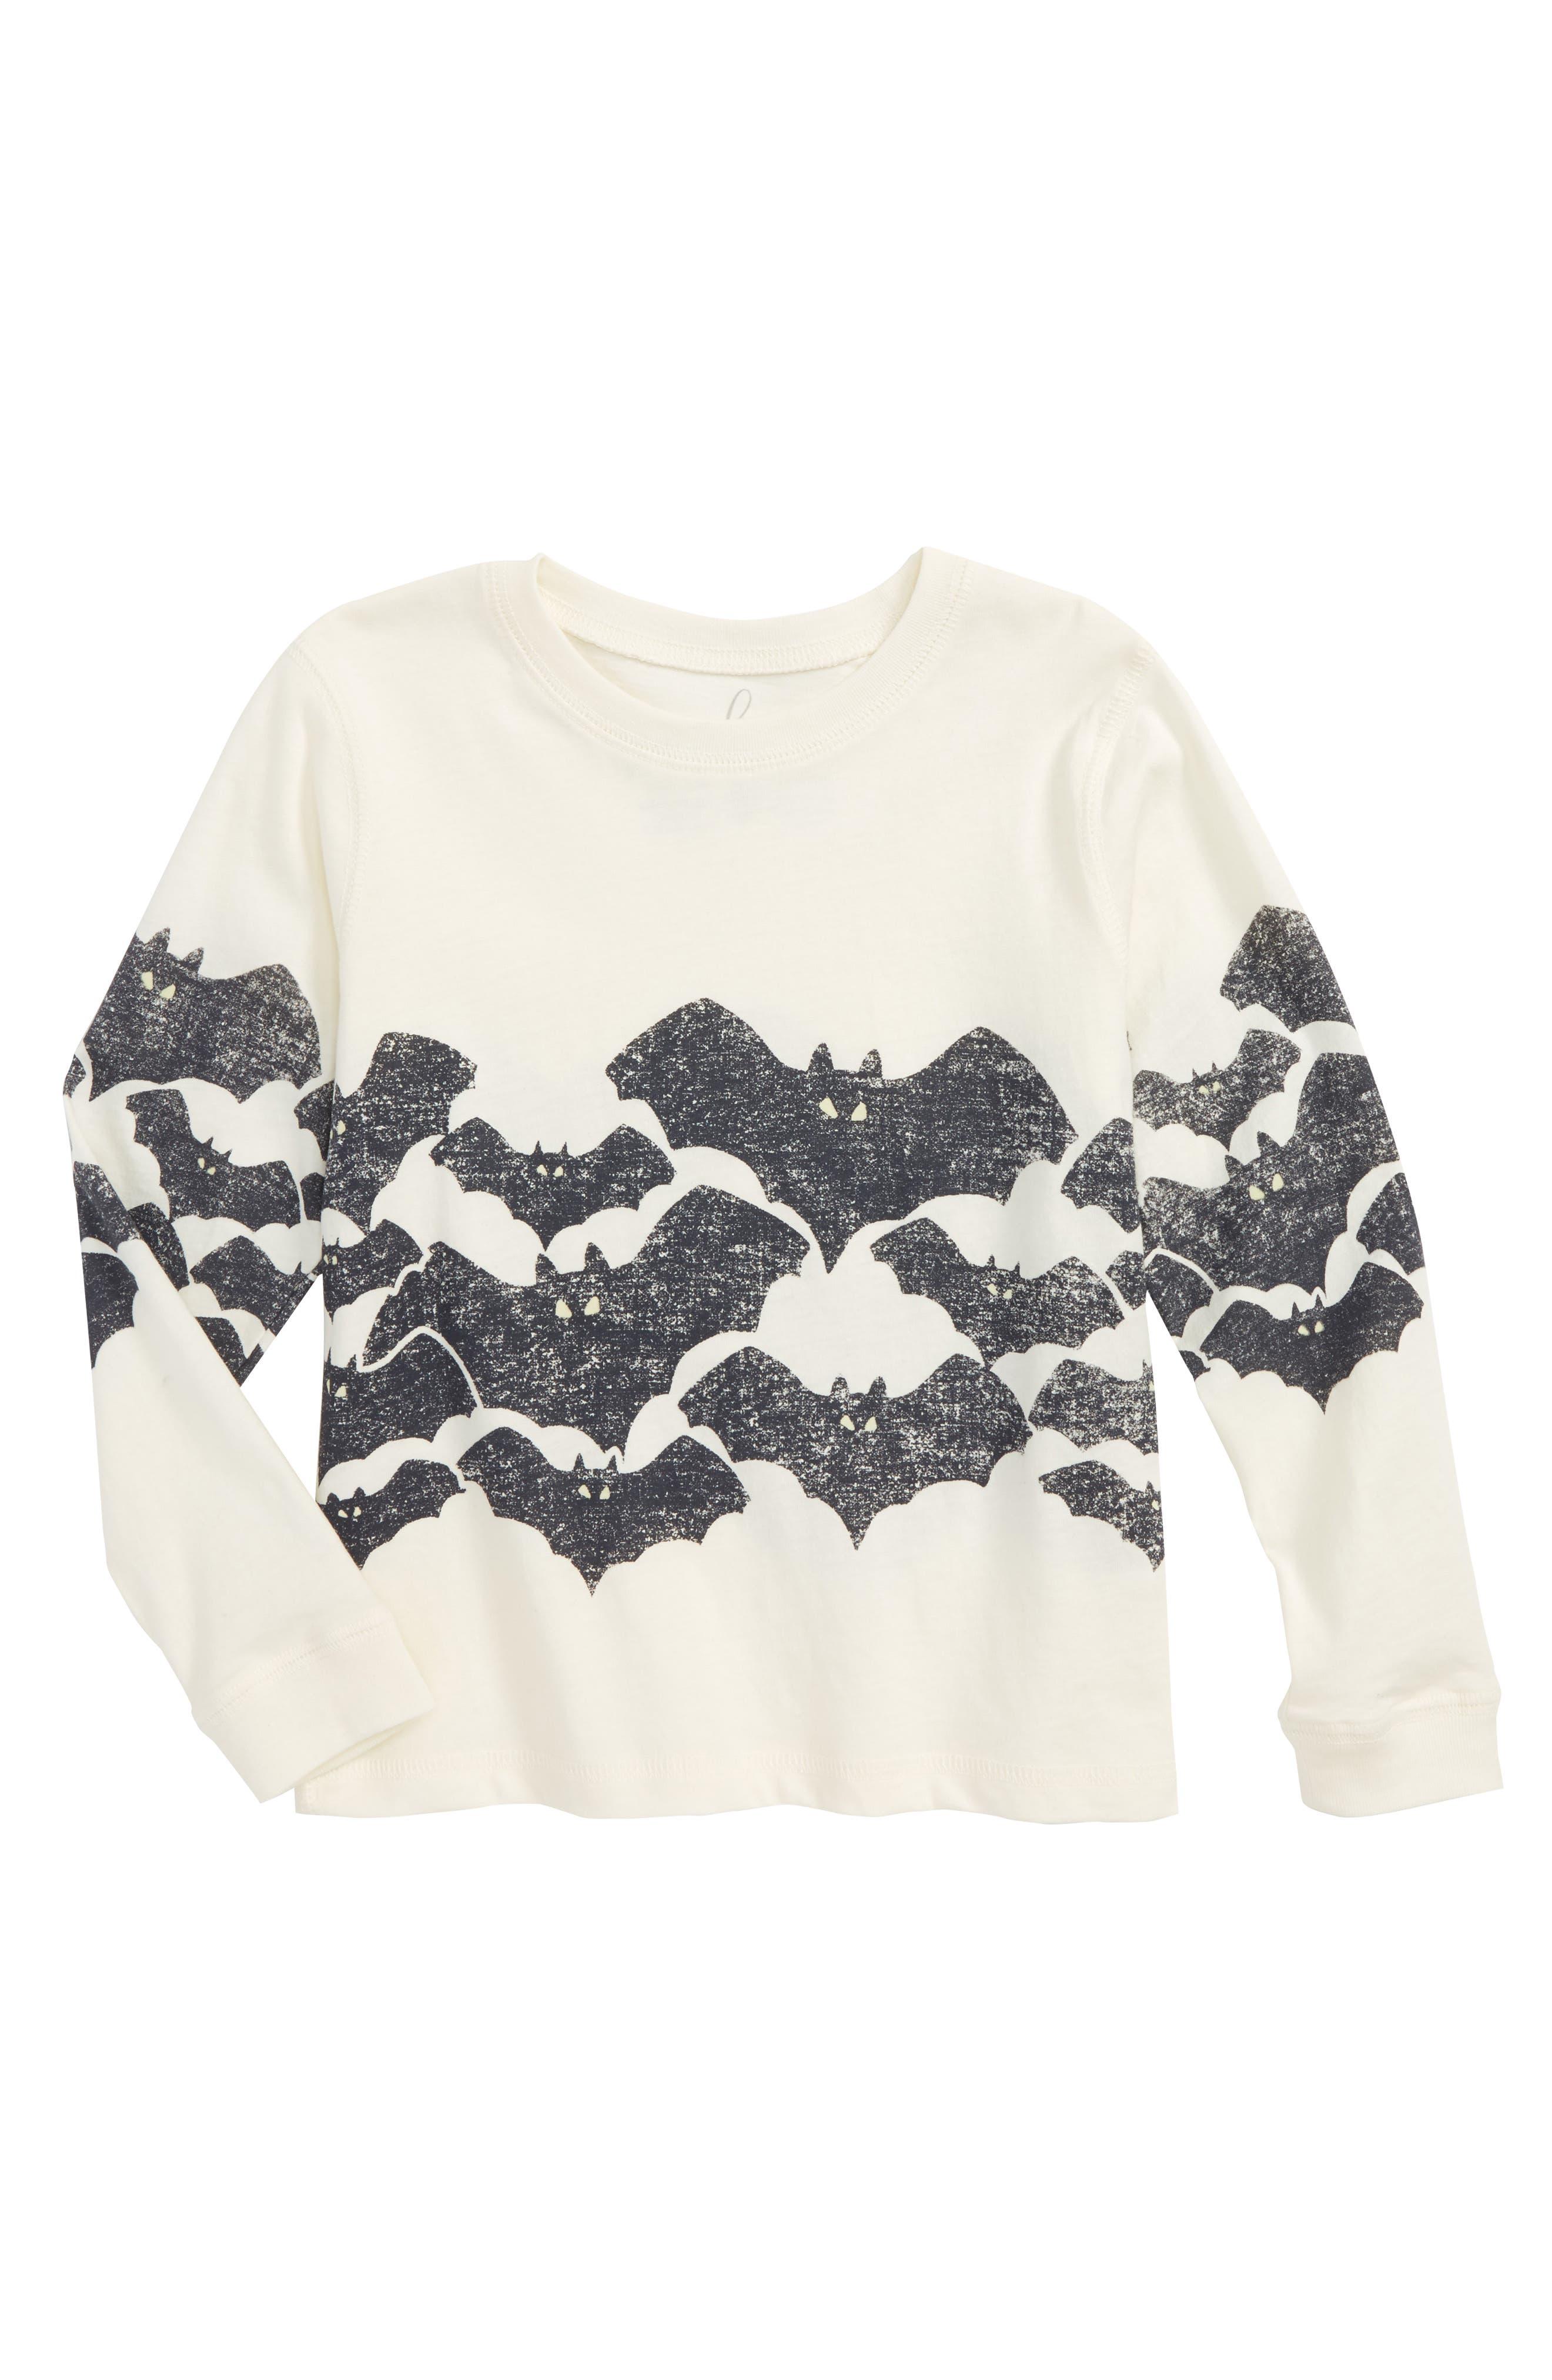 Bats Glow in the Dark T-Shirt,                         Main,                         color, 900